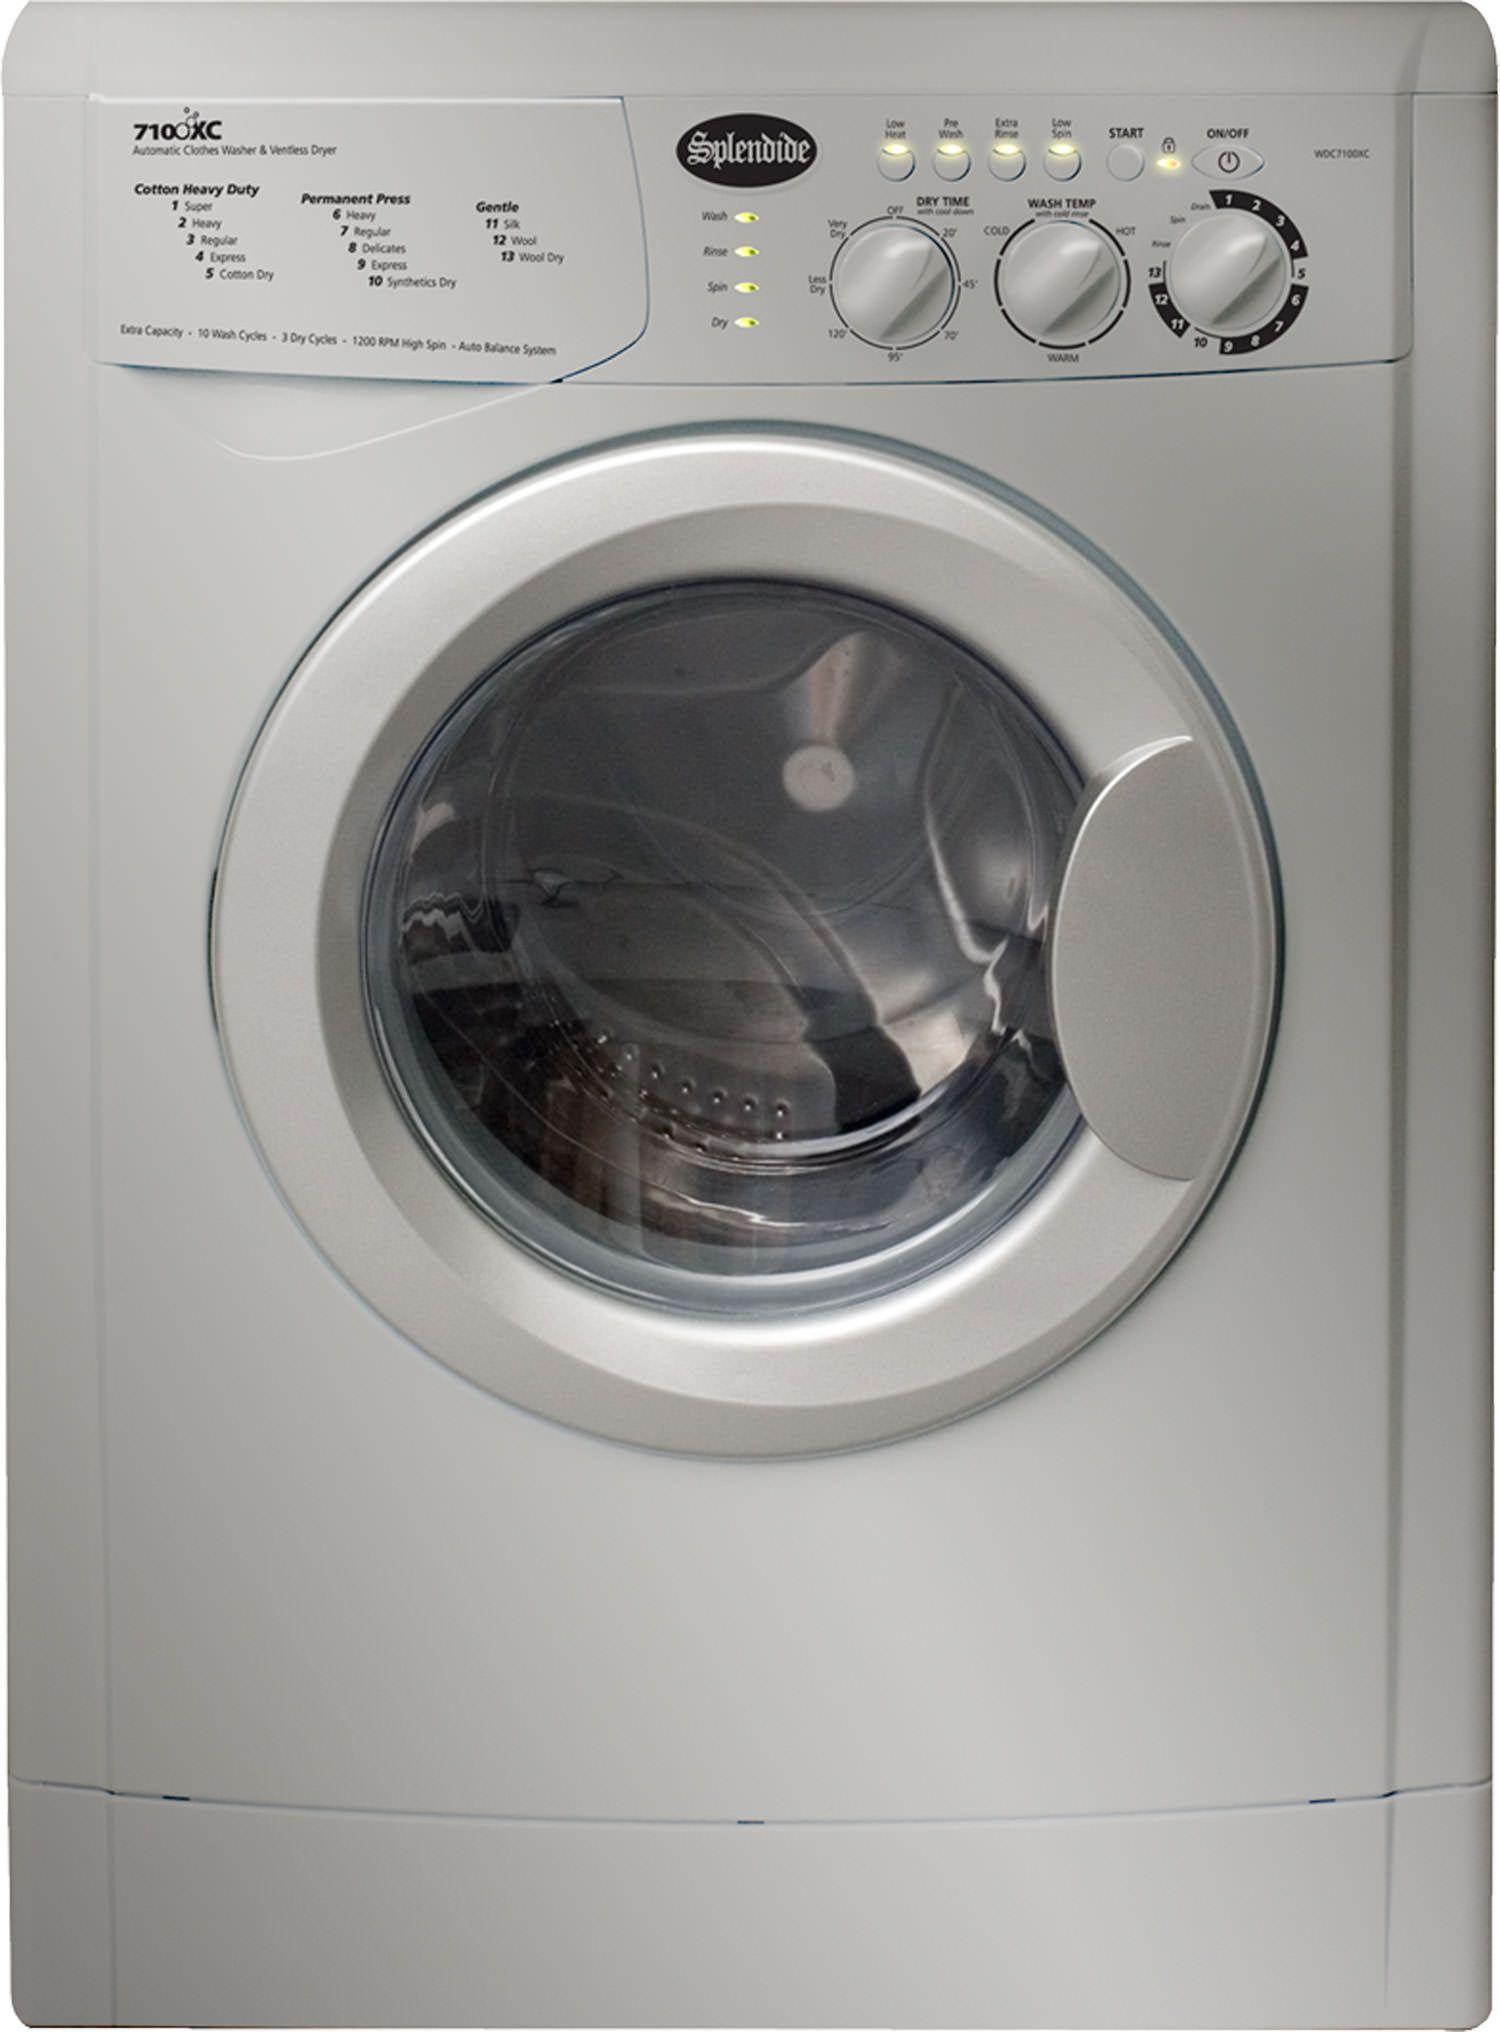 Splendide 7100xc Washer Dryer Platinum Laundry Room Laundry Room Storage Laundry